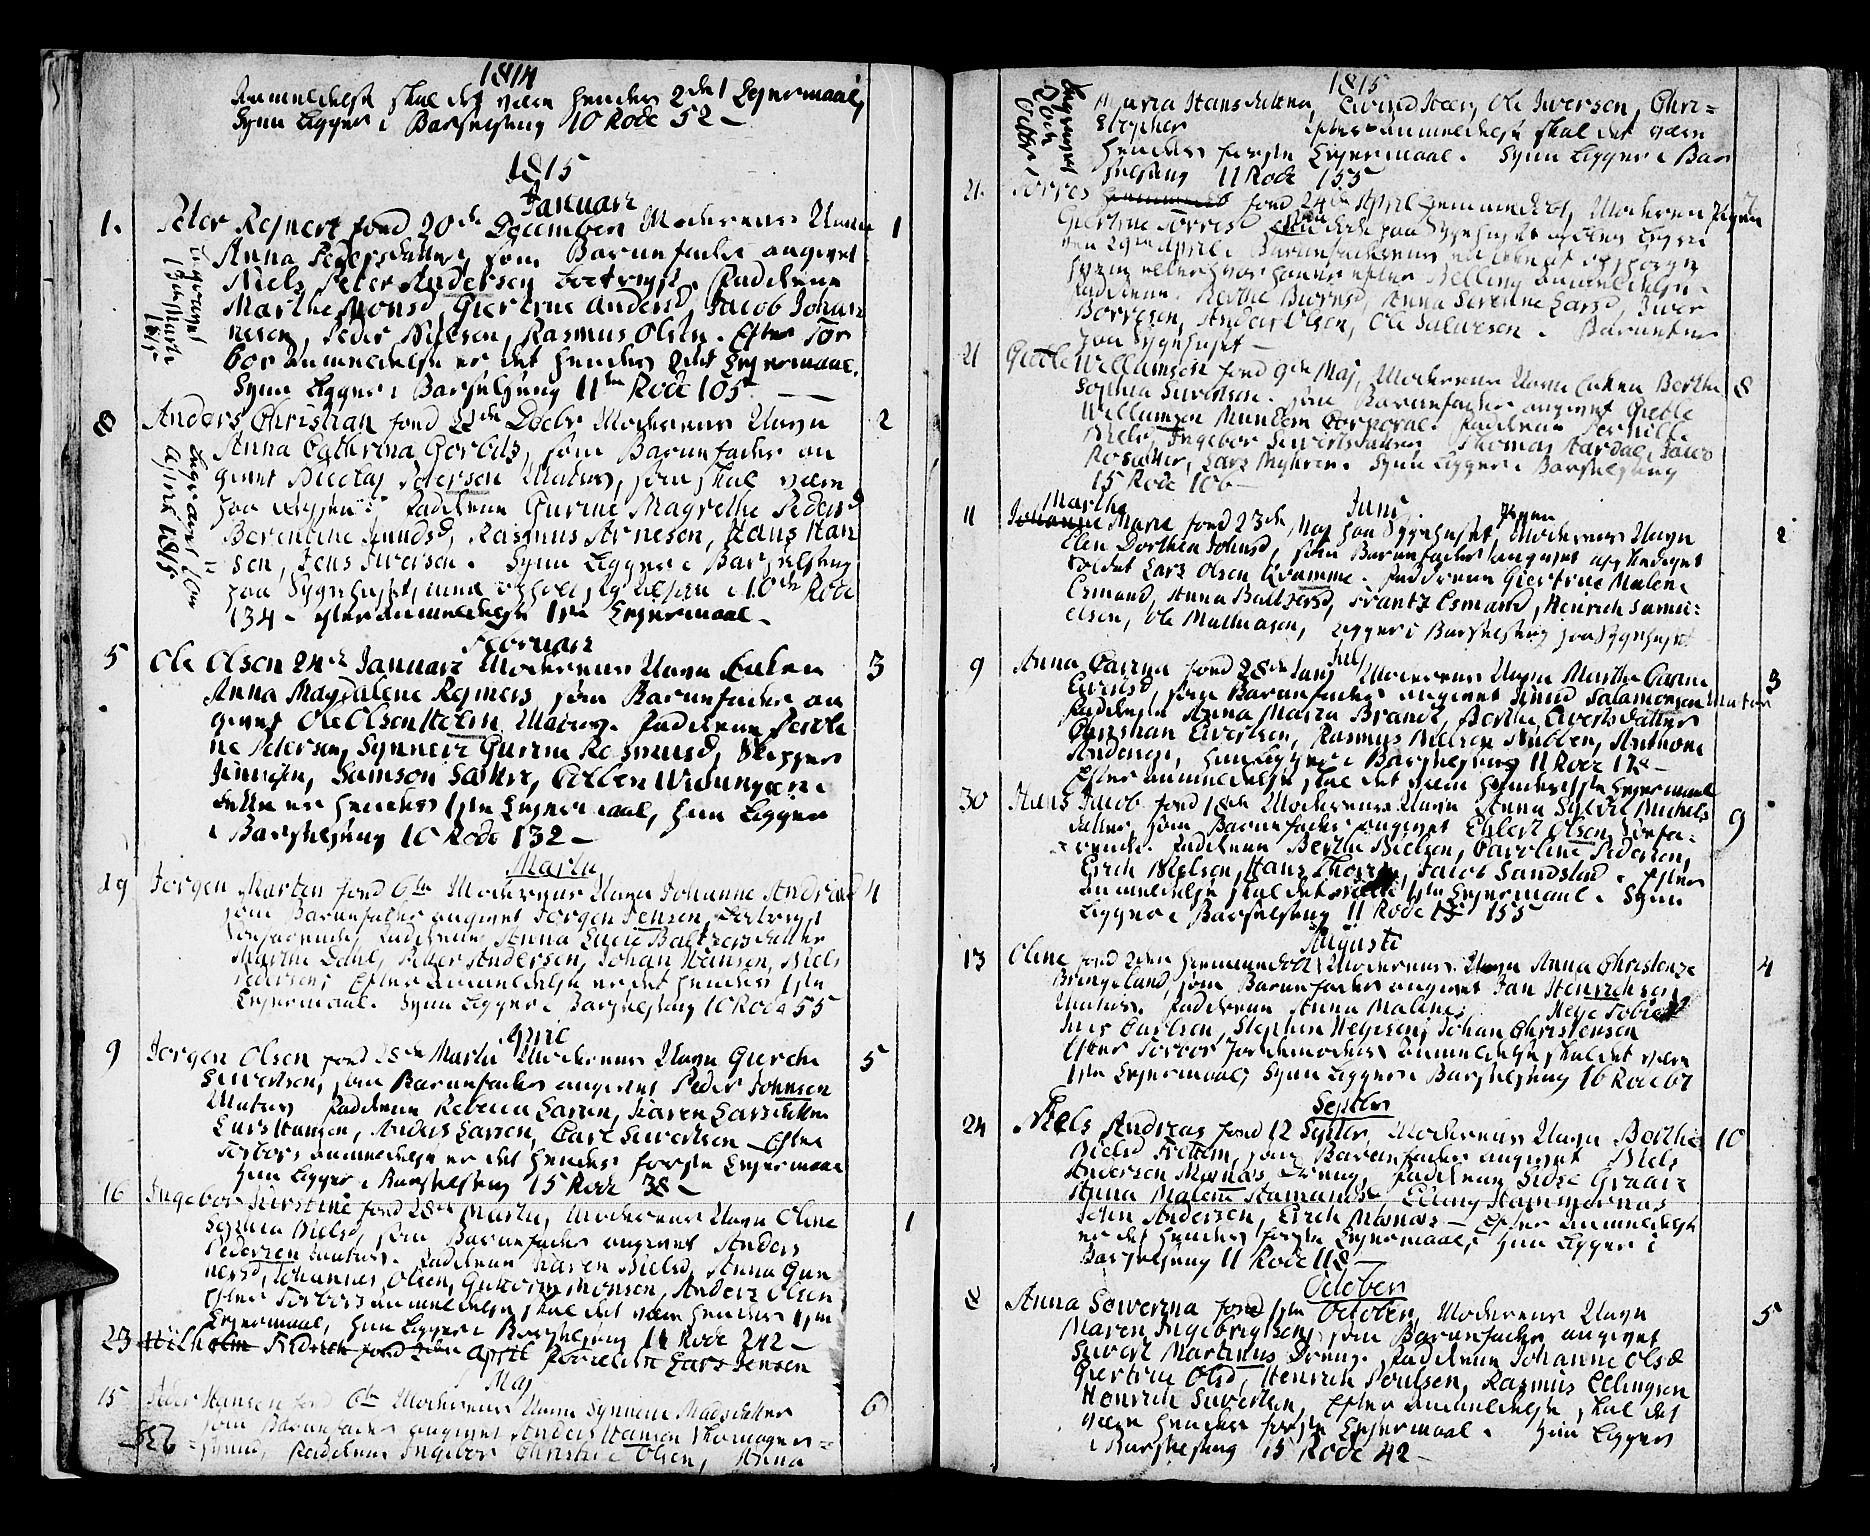 SAB, Domkirken Sokneprestembete, H/Haa/L0005: Ministerialbok nr. A 5, 1808-1820, s. 234-235